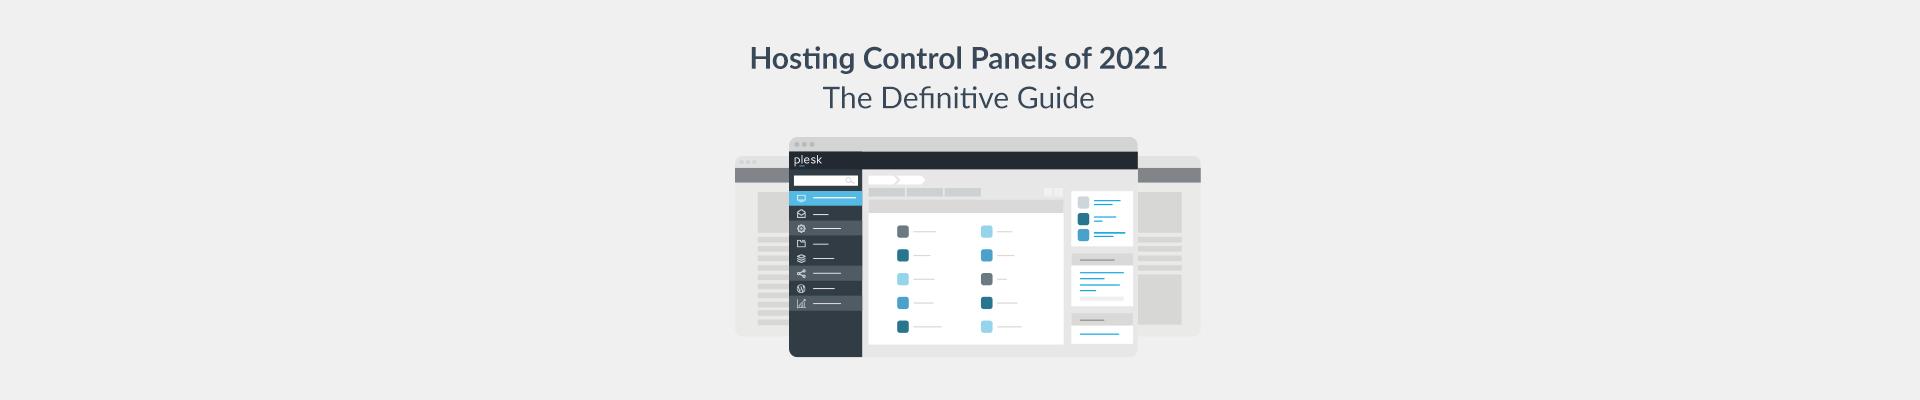 Hosting Control Panels 2021